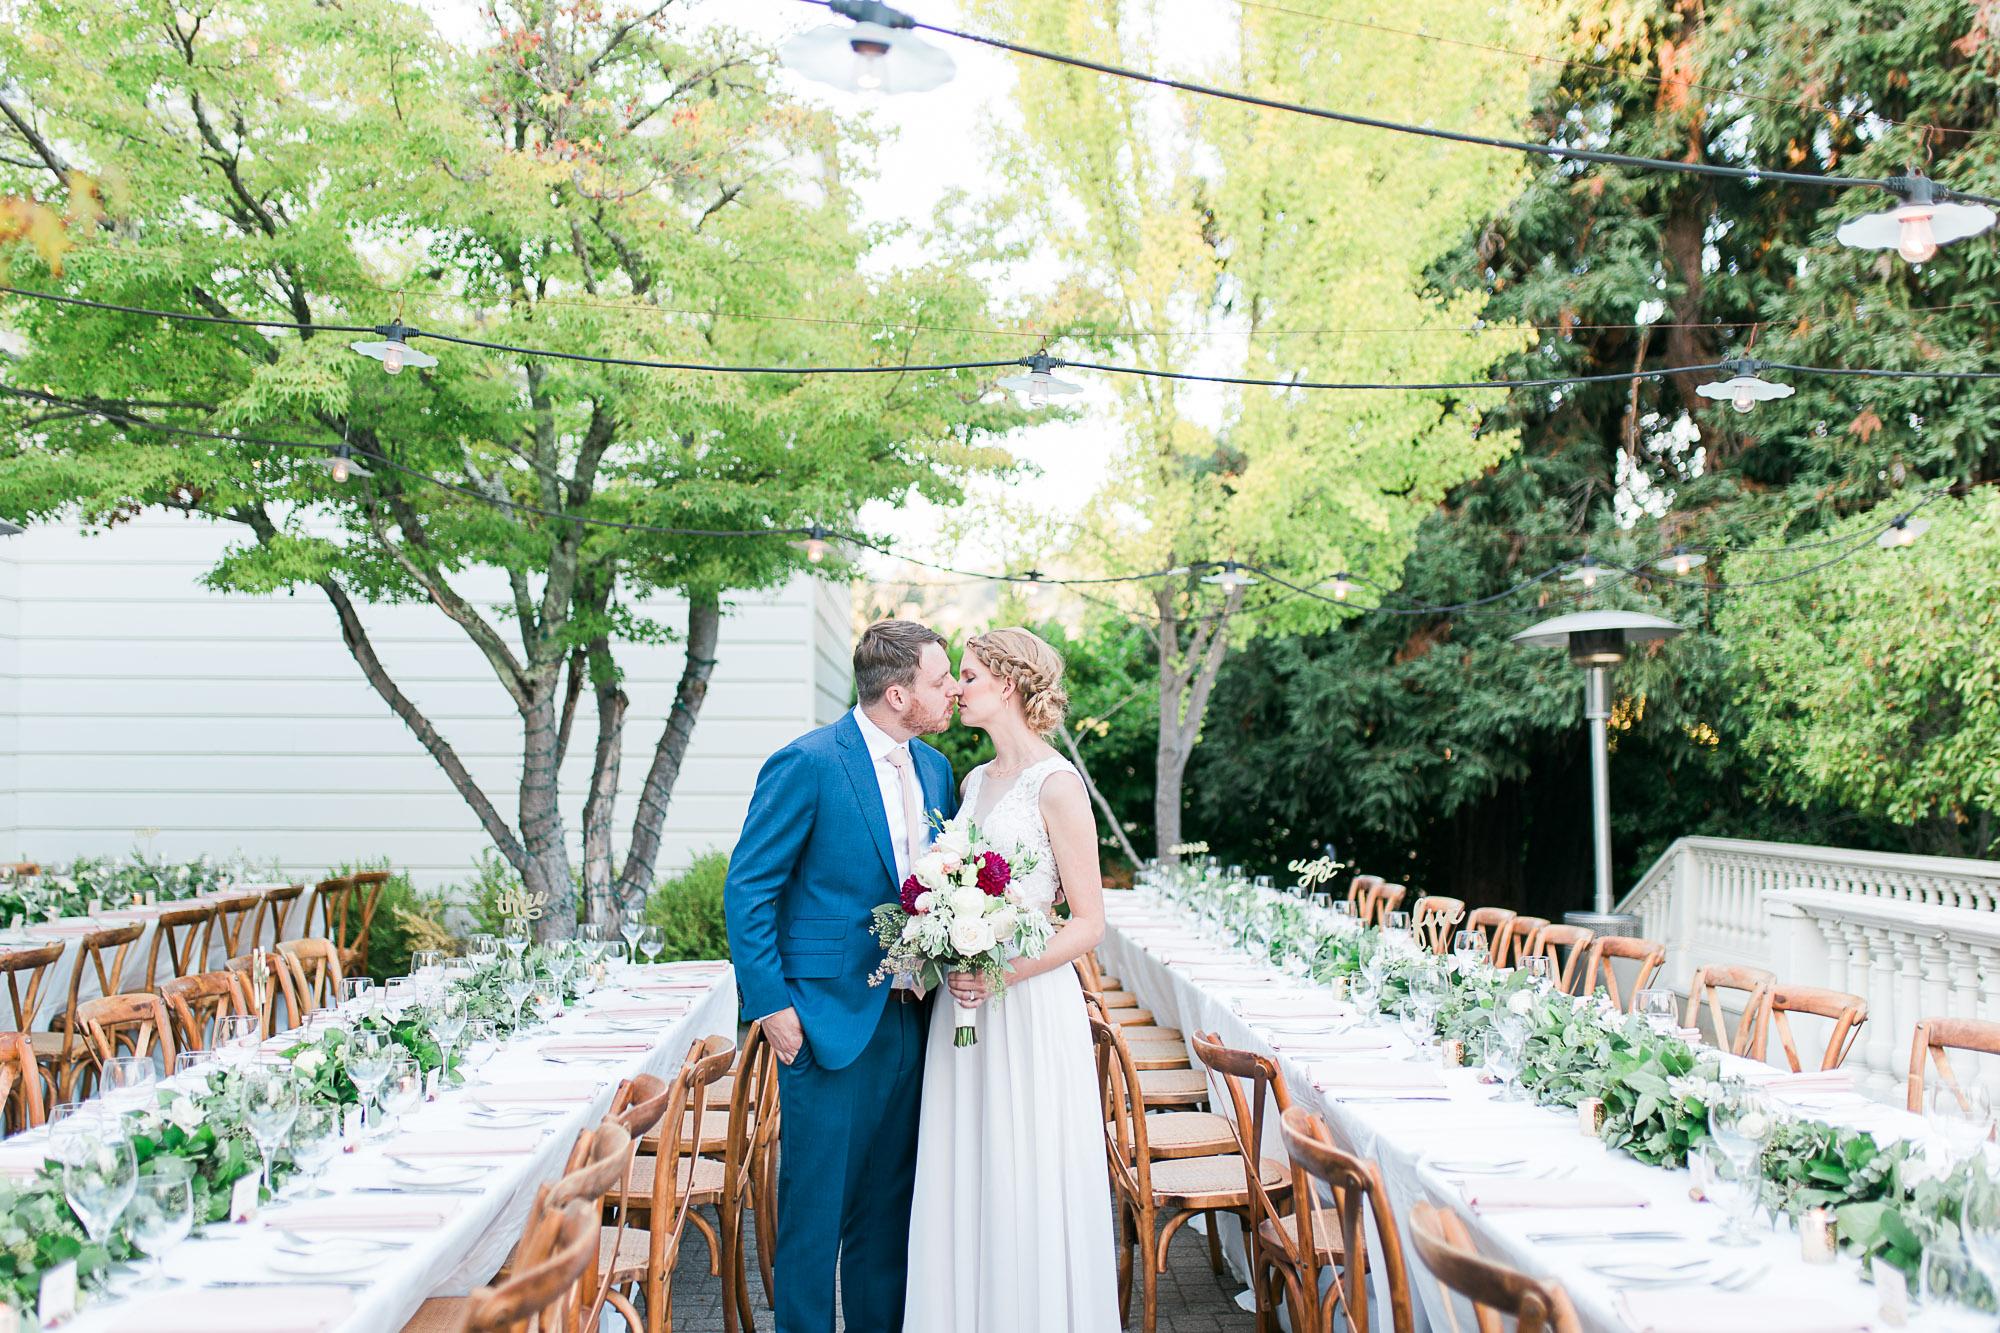 Generals Daughter Wedding Photos by JBJ Pictures - Ramekins Wedding Venue Photographer in Sonoma, Napa (33).jpg